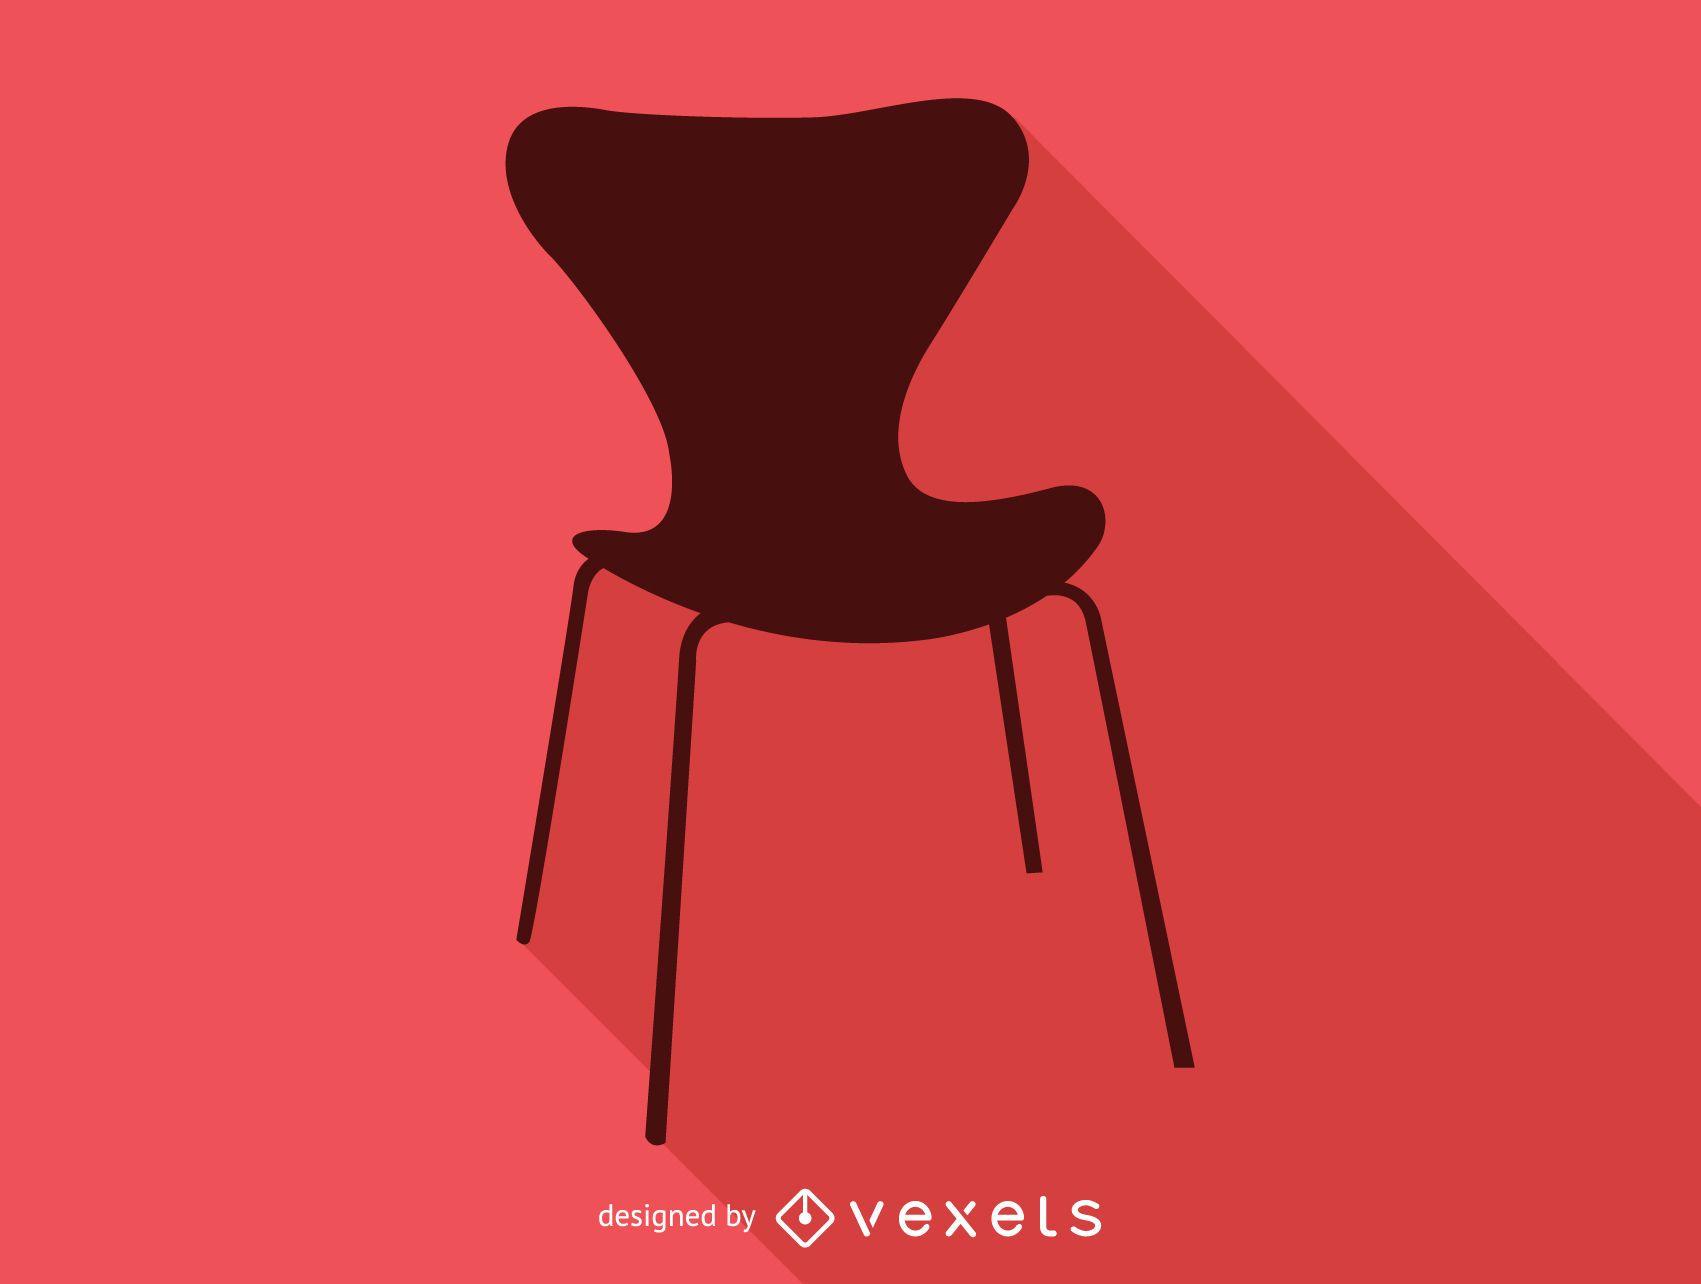 Arne Jacobsen chair silhouette icon